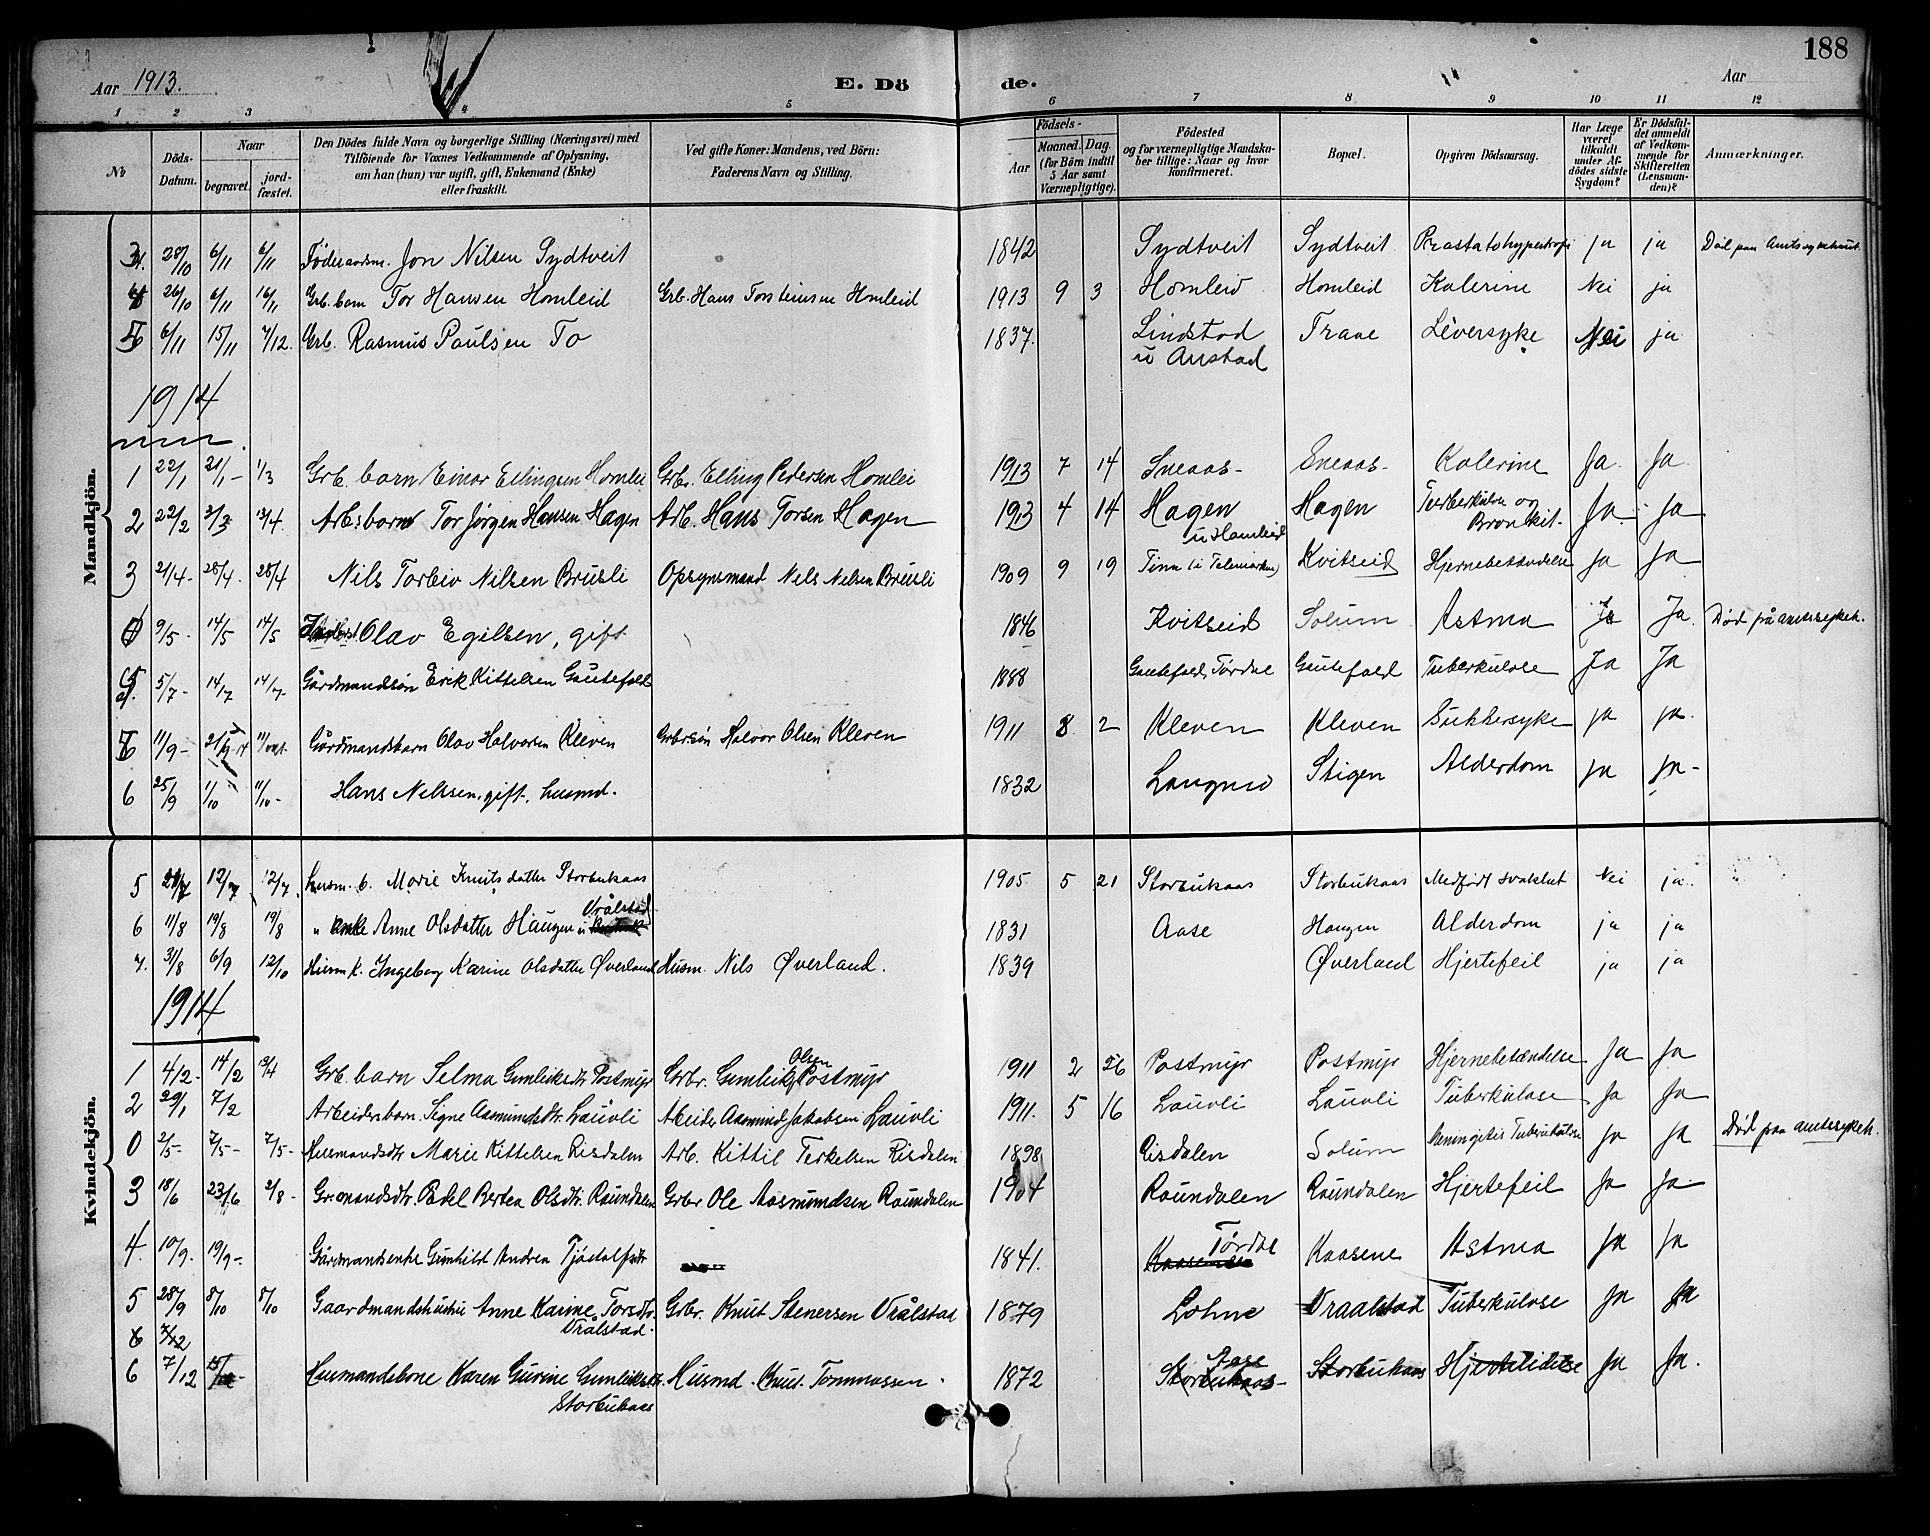 SAKO, Drangedal kirkebøker, G/Gb/L0002: Klokkerbok nr. II 2, 1895-1918, s. 188